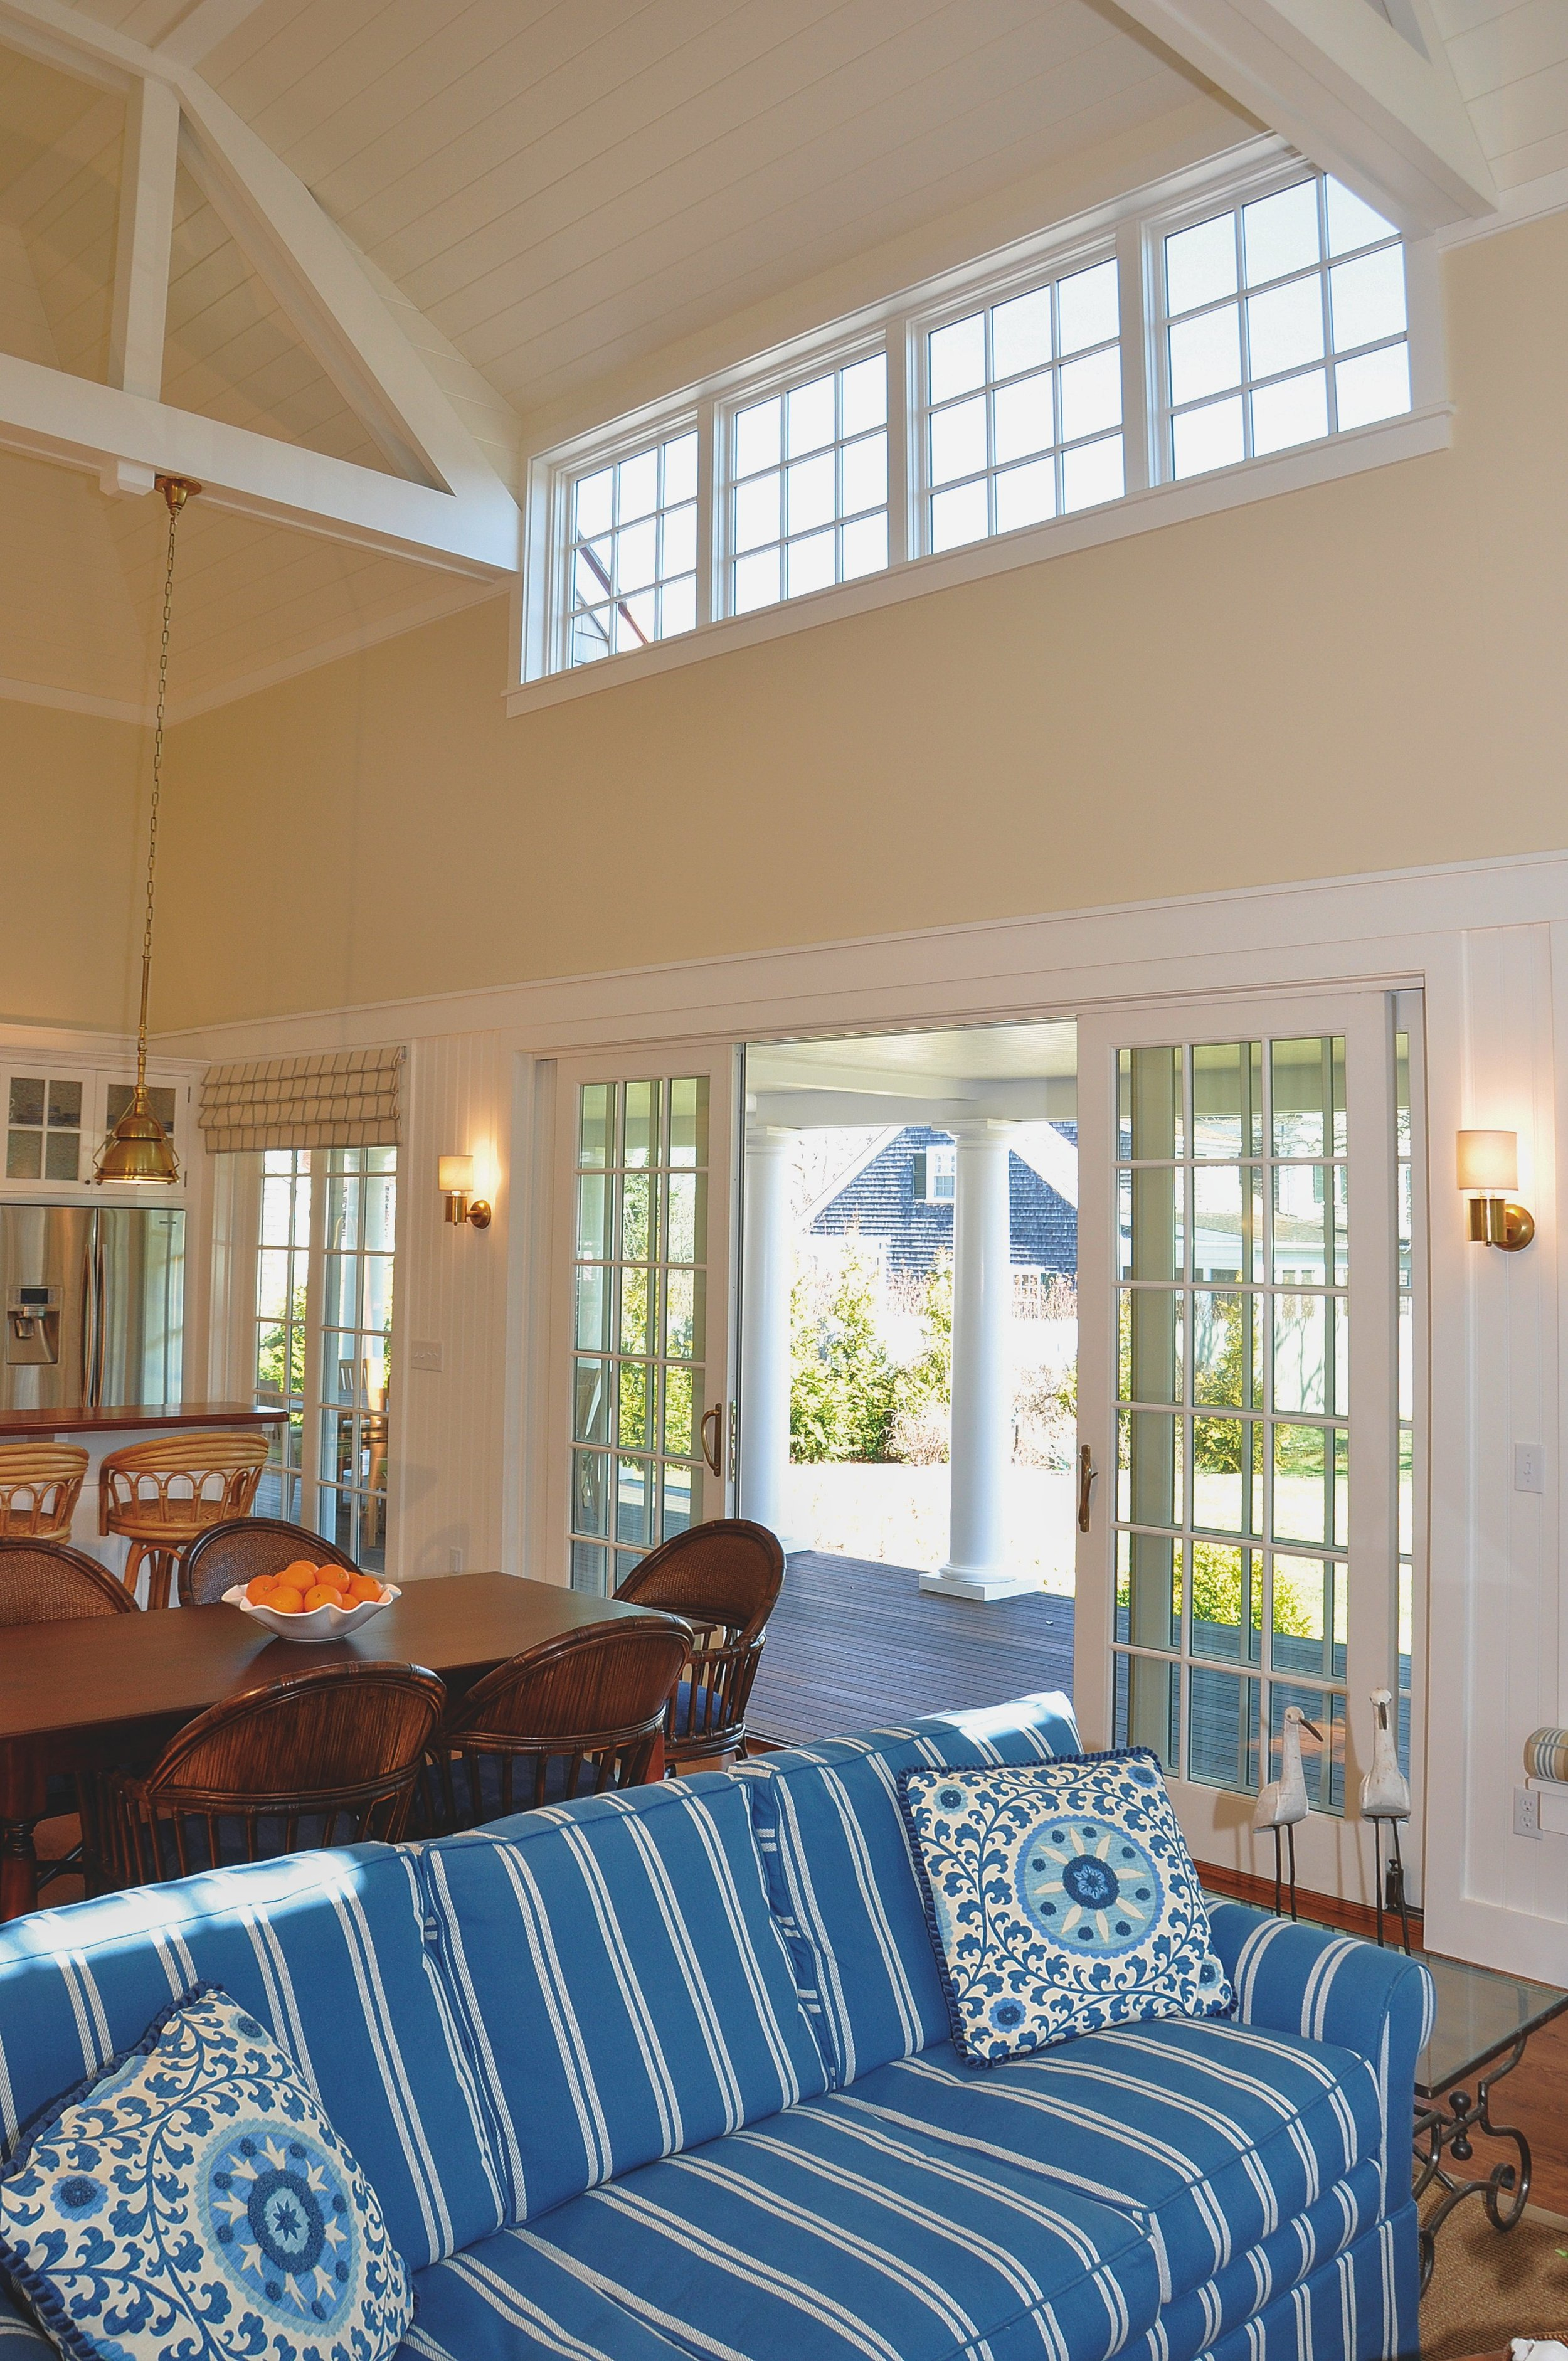 Farmhouse_Modern_Vaulted_Ceilings_Windows_Living_Room.jpg